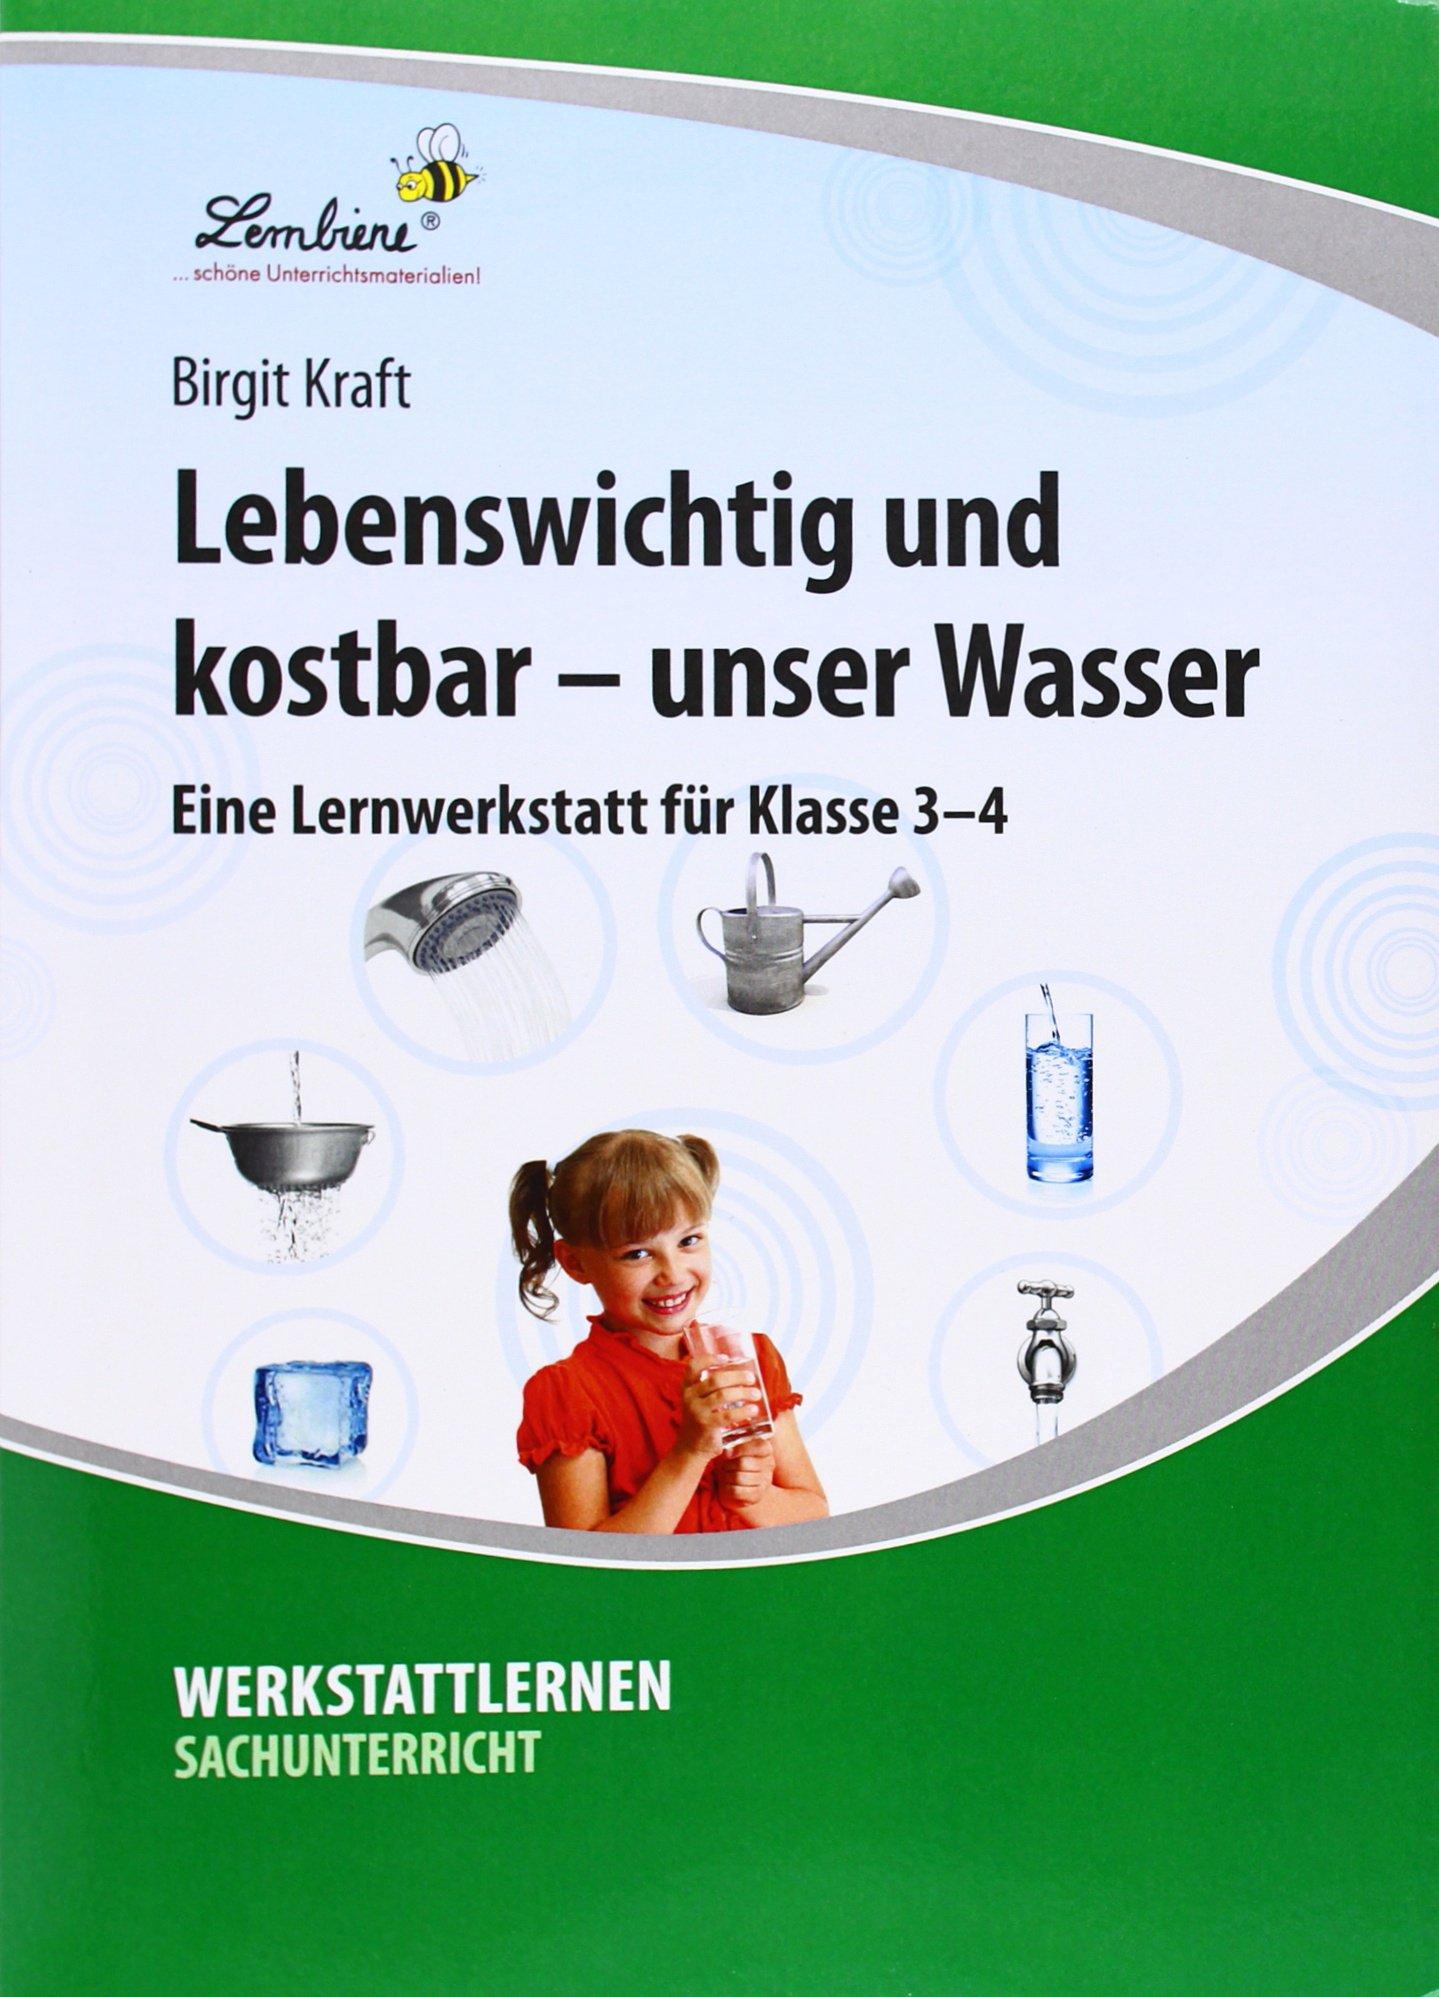 Themenheft Wasser 3./4. Klasse: Amazon.de: Alice Undorf: Bücher